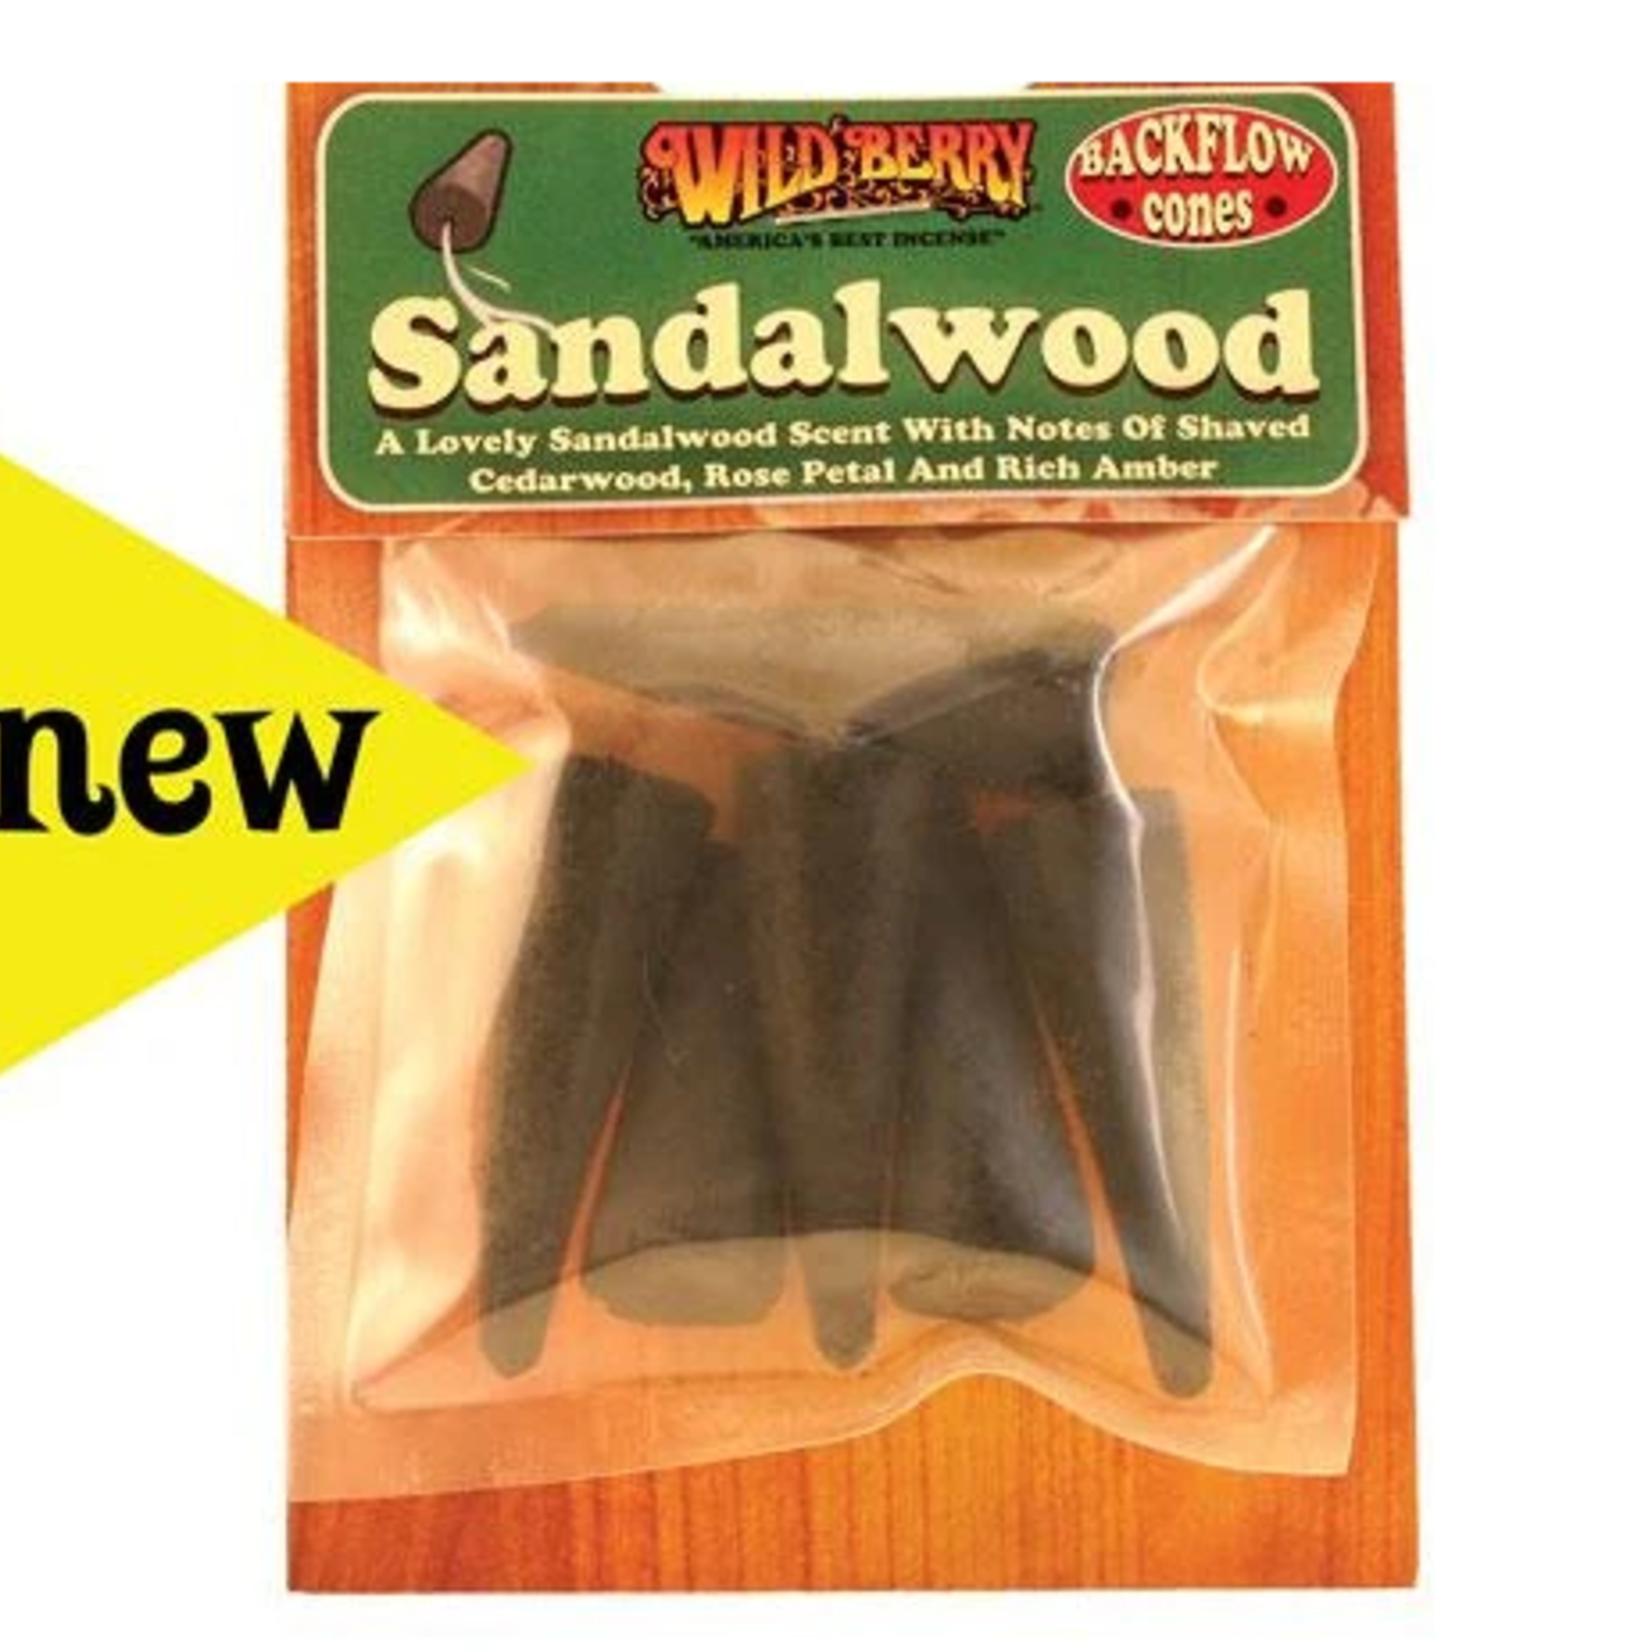 Wildberry- Sandalwood Backflow Incense Cone